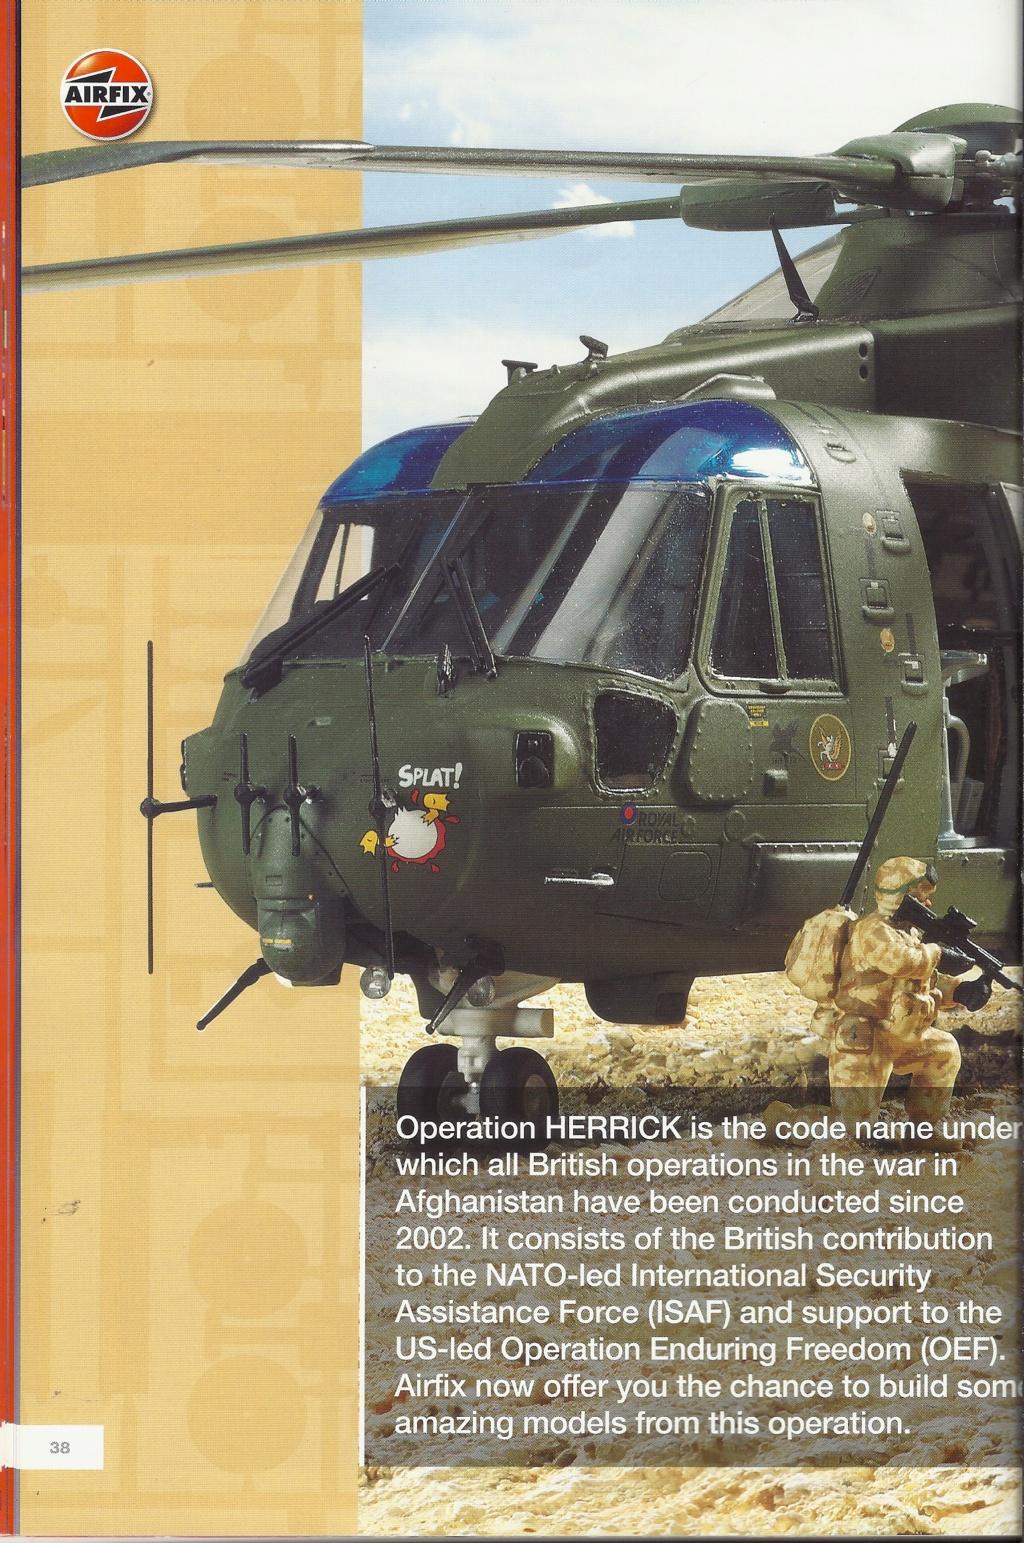 [AIRFIX 2013] Catalogue 2013 Airf1490